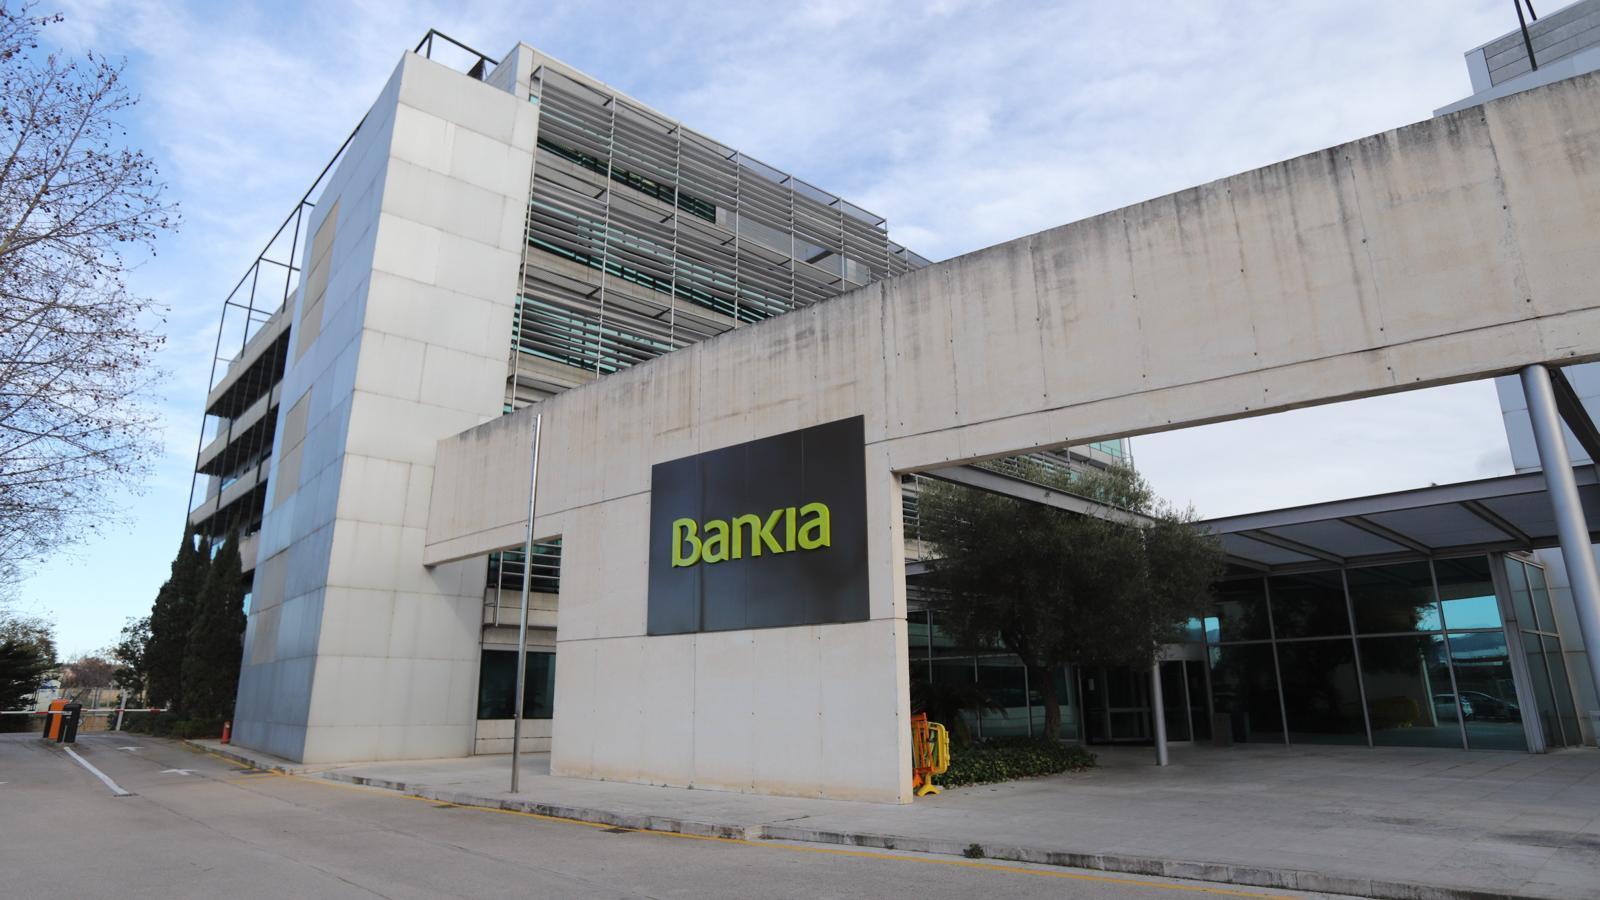 Oficina de Son Fuster amb el logotip de Bankia